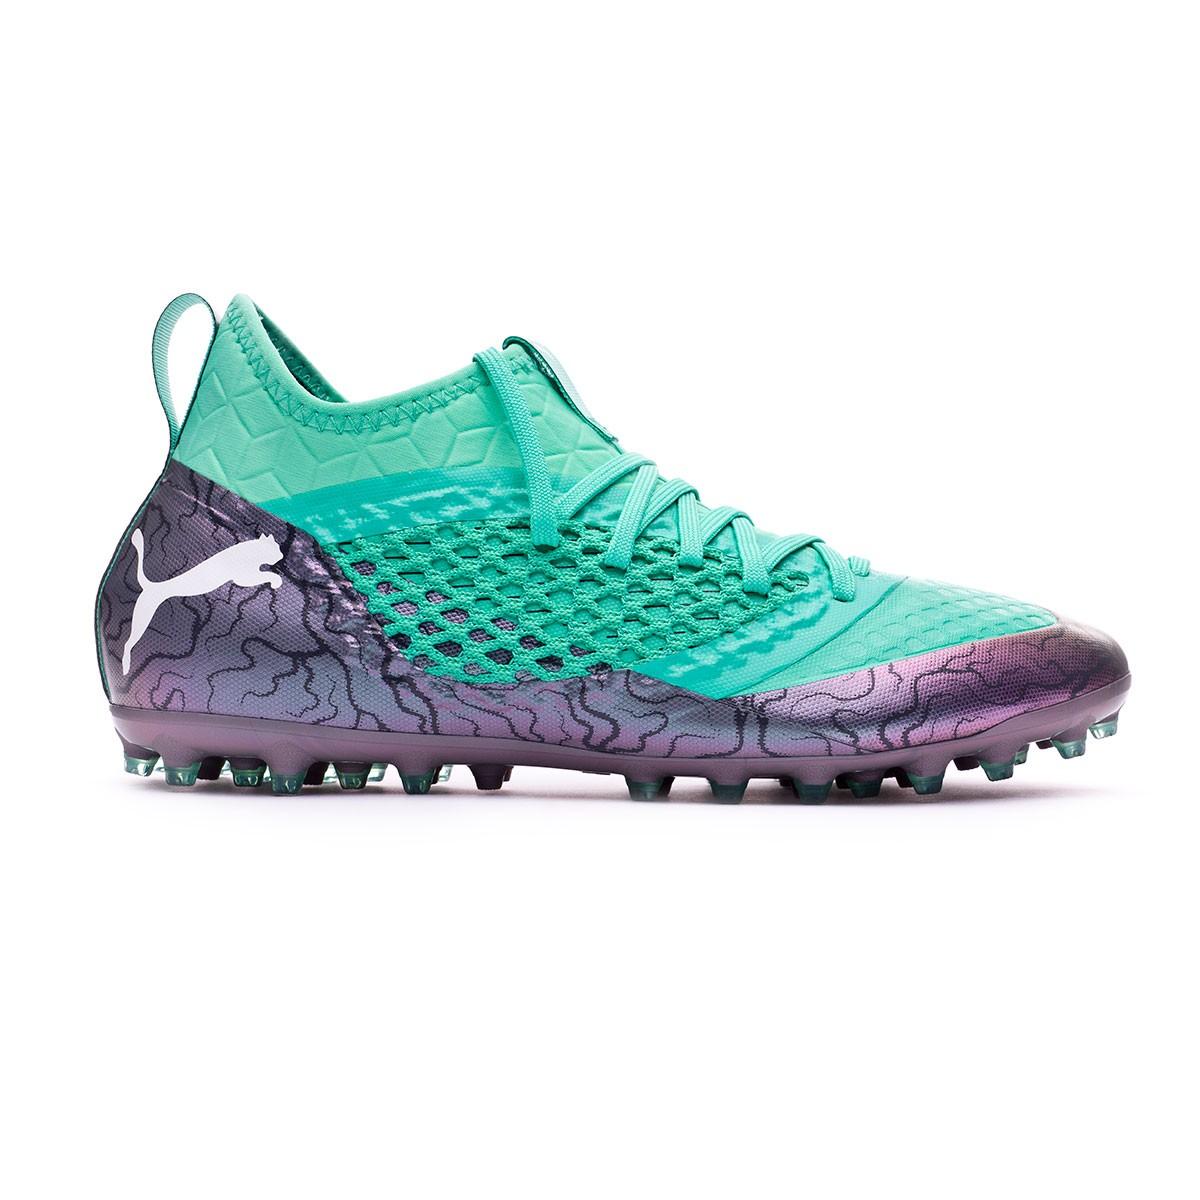 038692a0af160 Football Boots Puma Future 2.3 Netfit MG Shift-Biscay green-Puma white -  Football store Fútbol Emotion